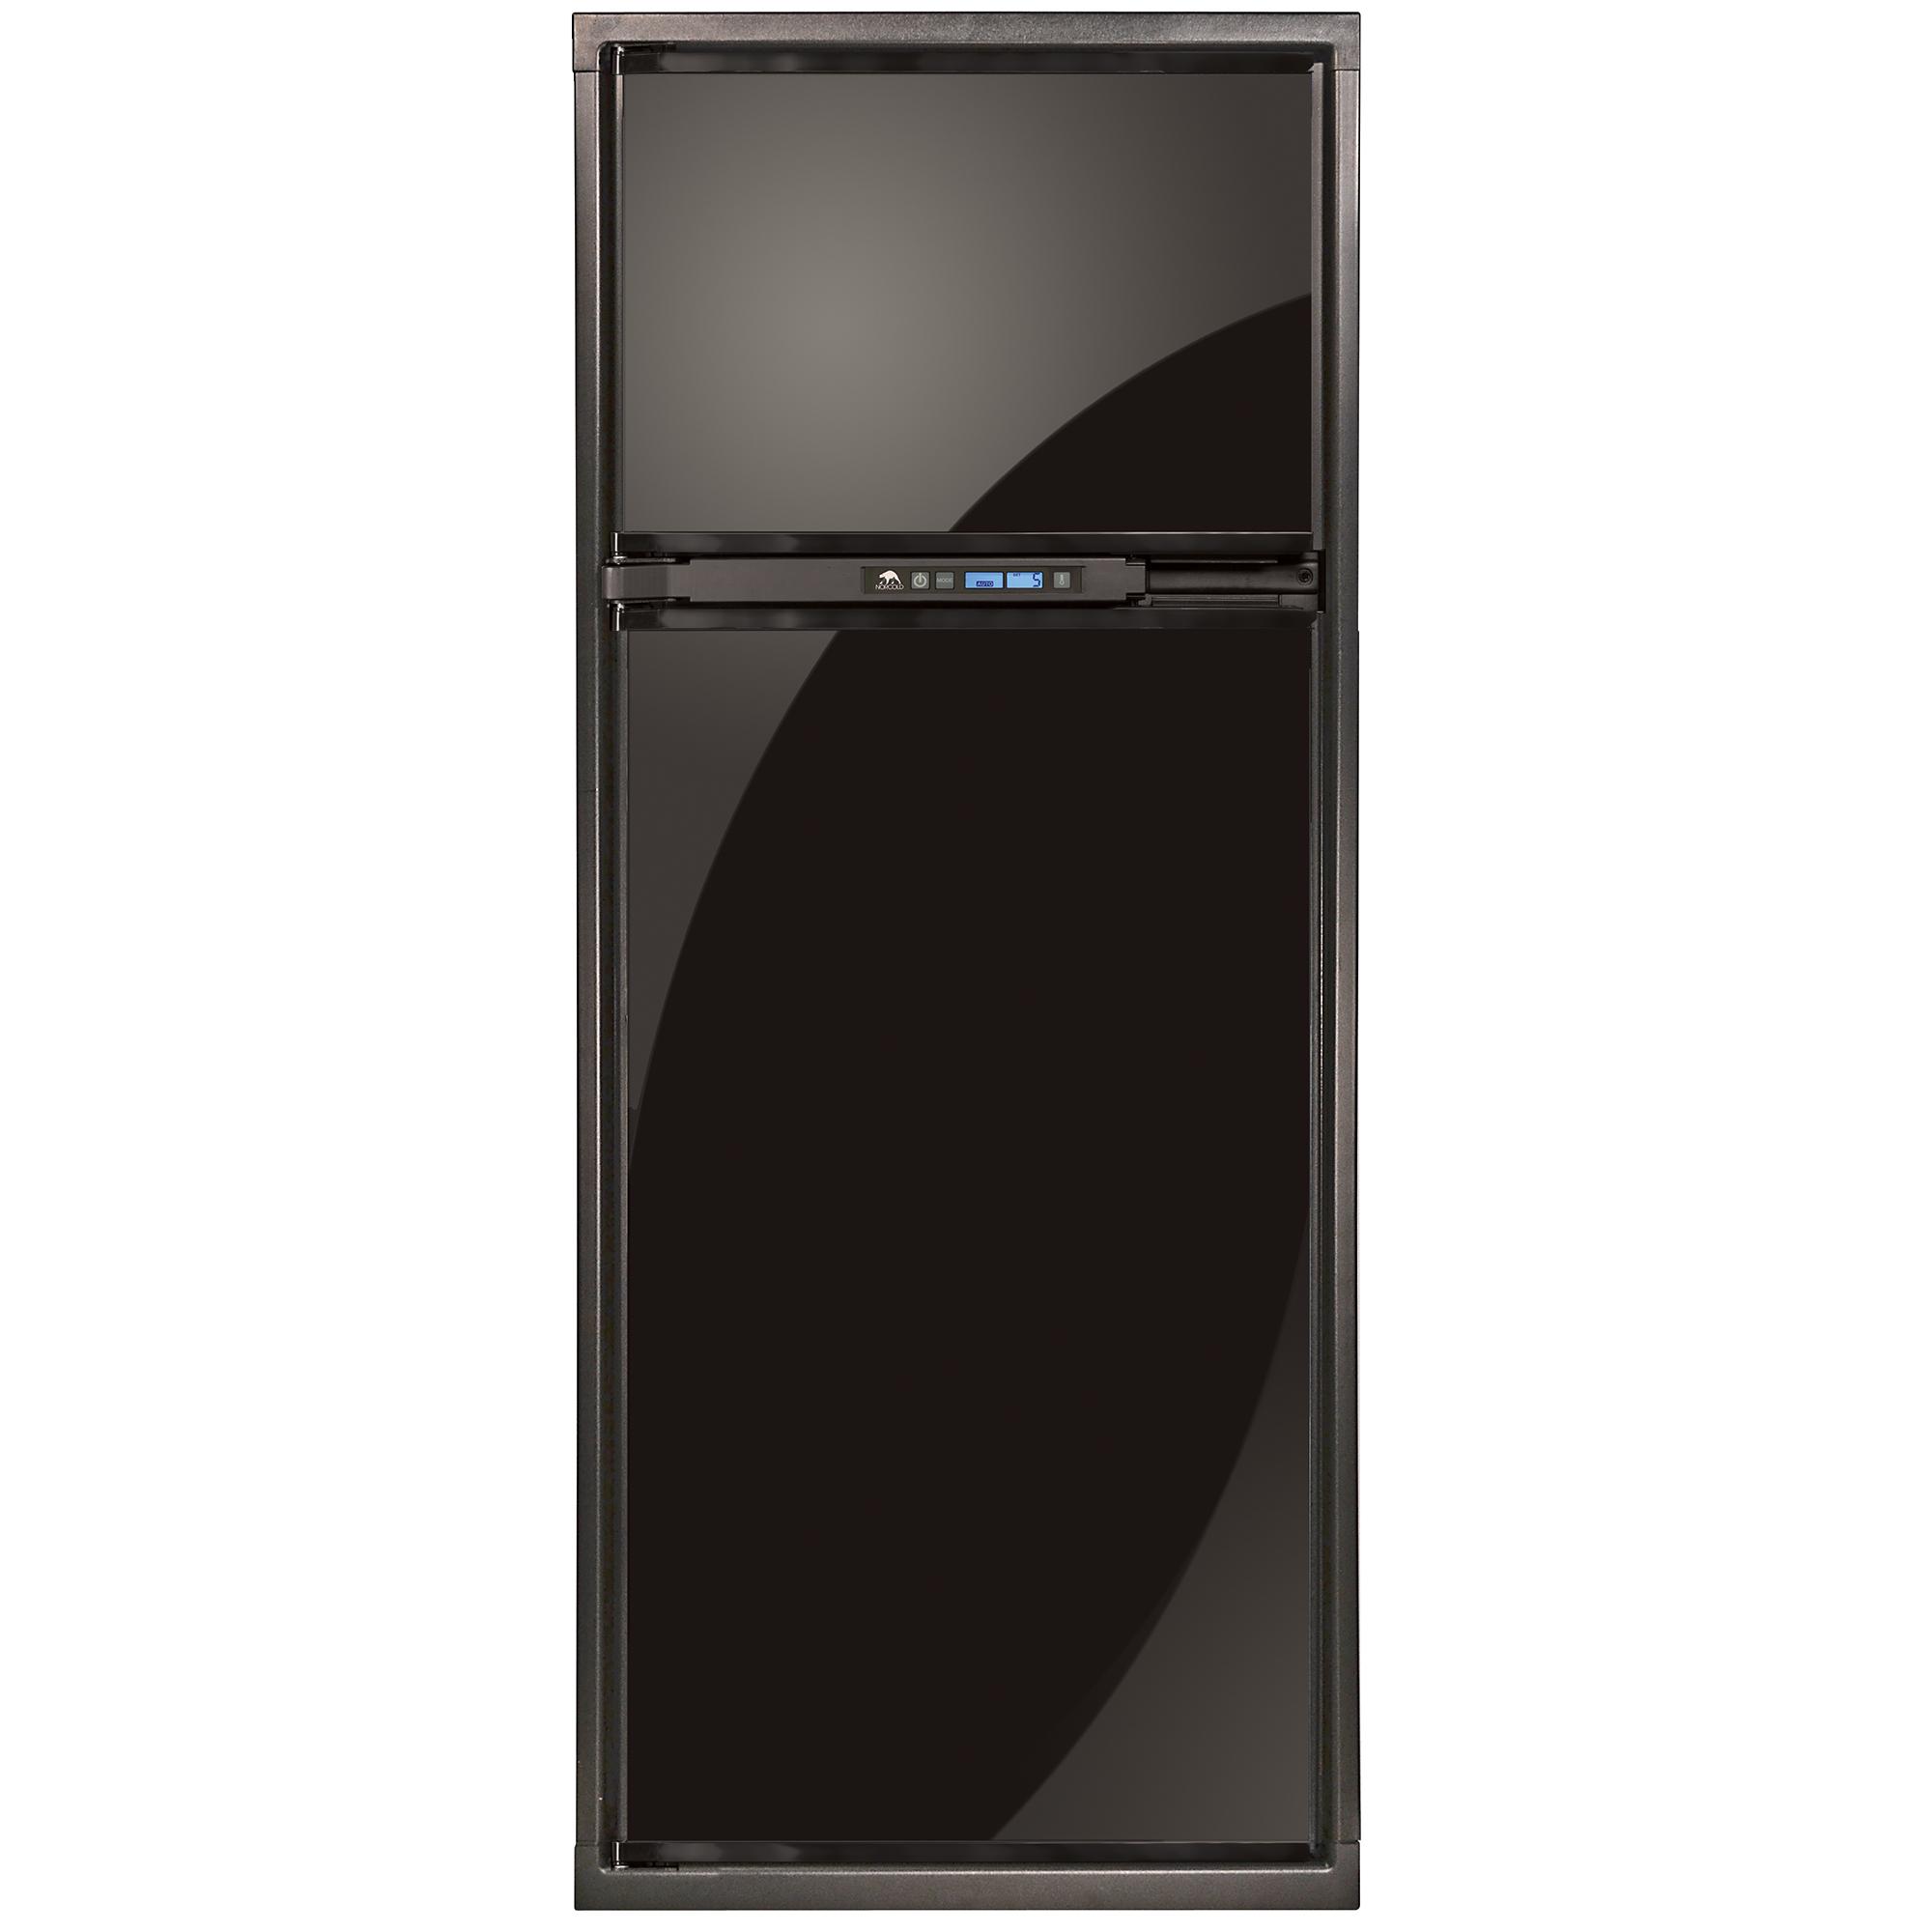 Norcold® Polar 8LX Refrigerator, 8 cu. ft. 2-way, Right Swing Door (NA8LXR) photo